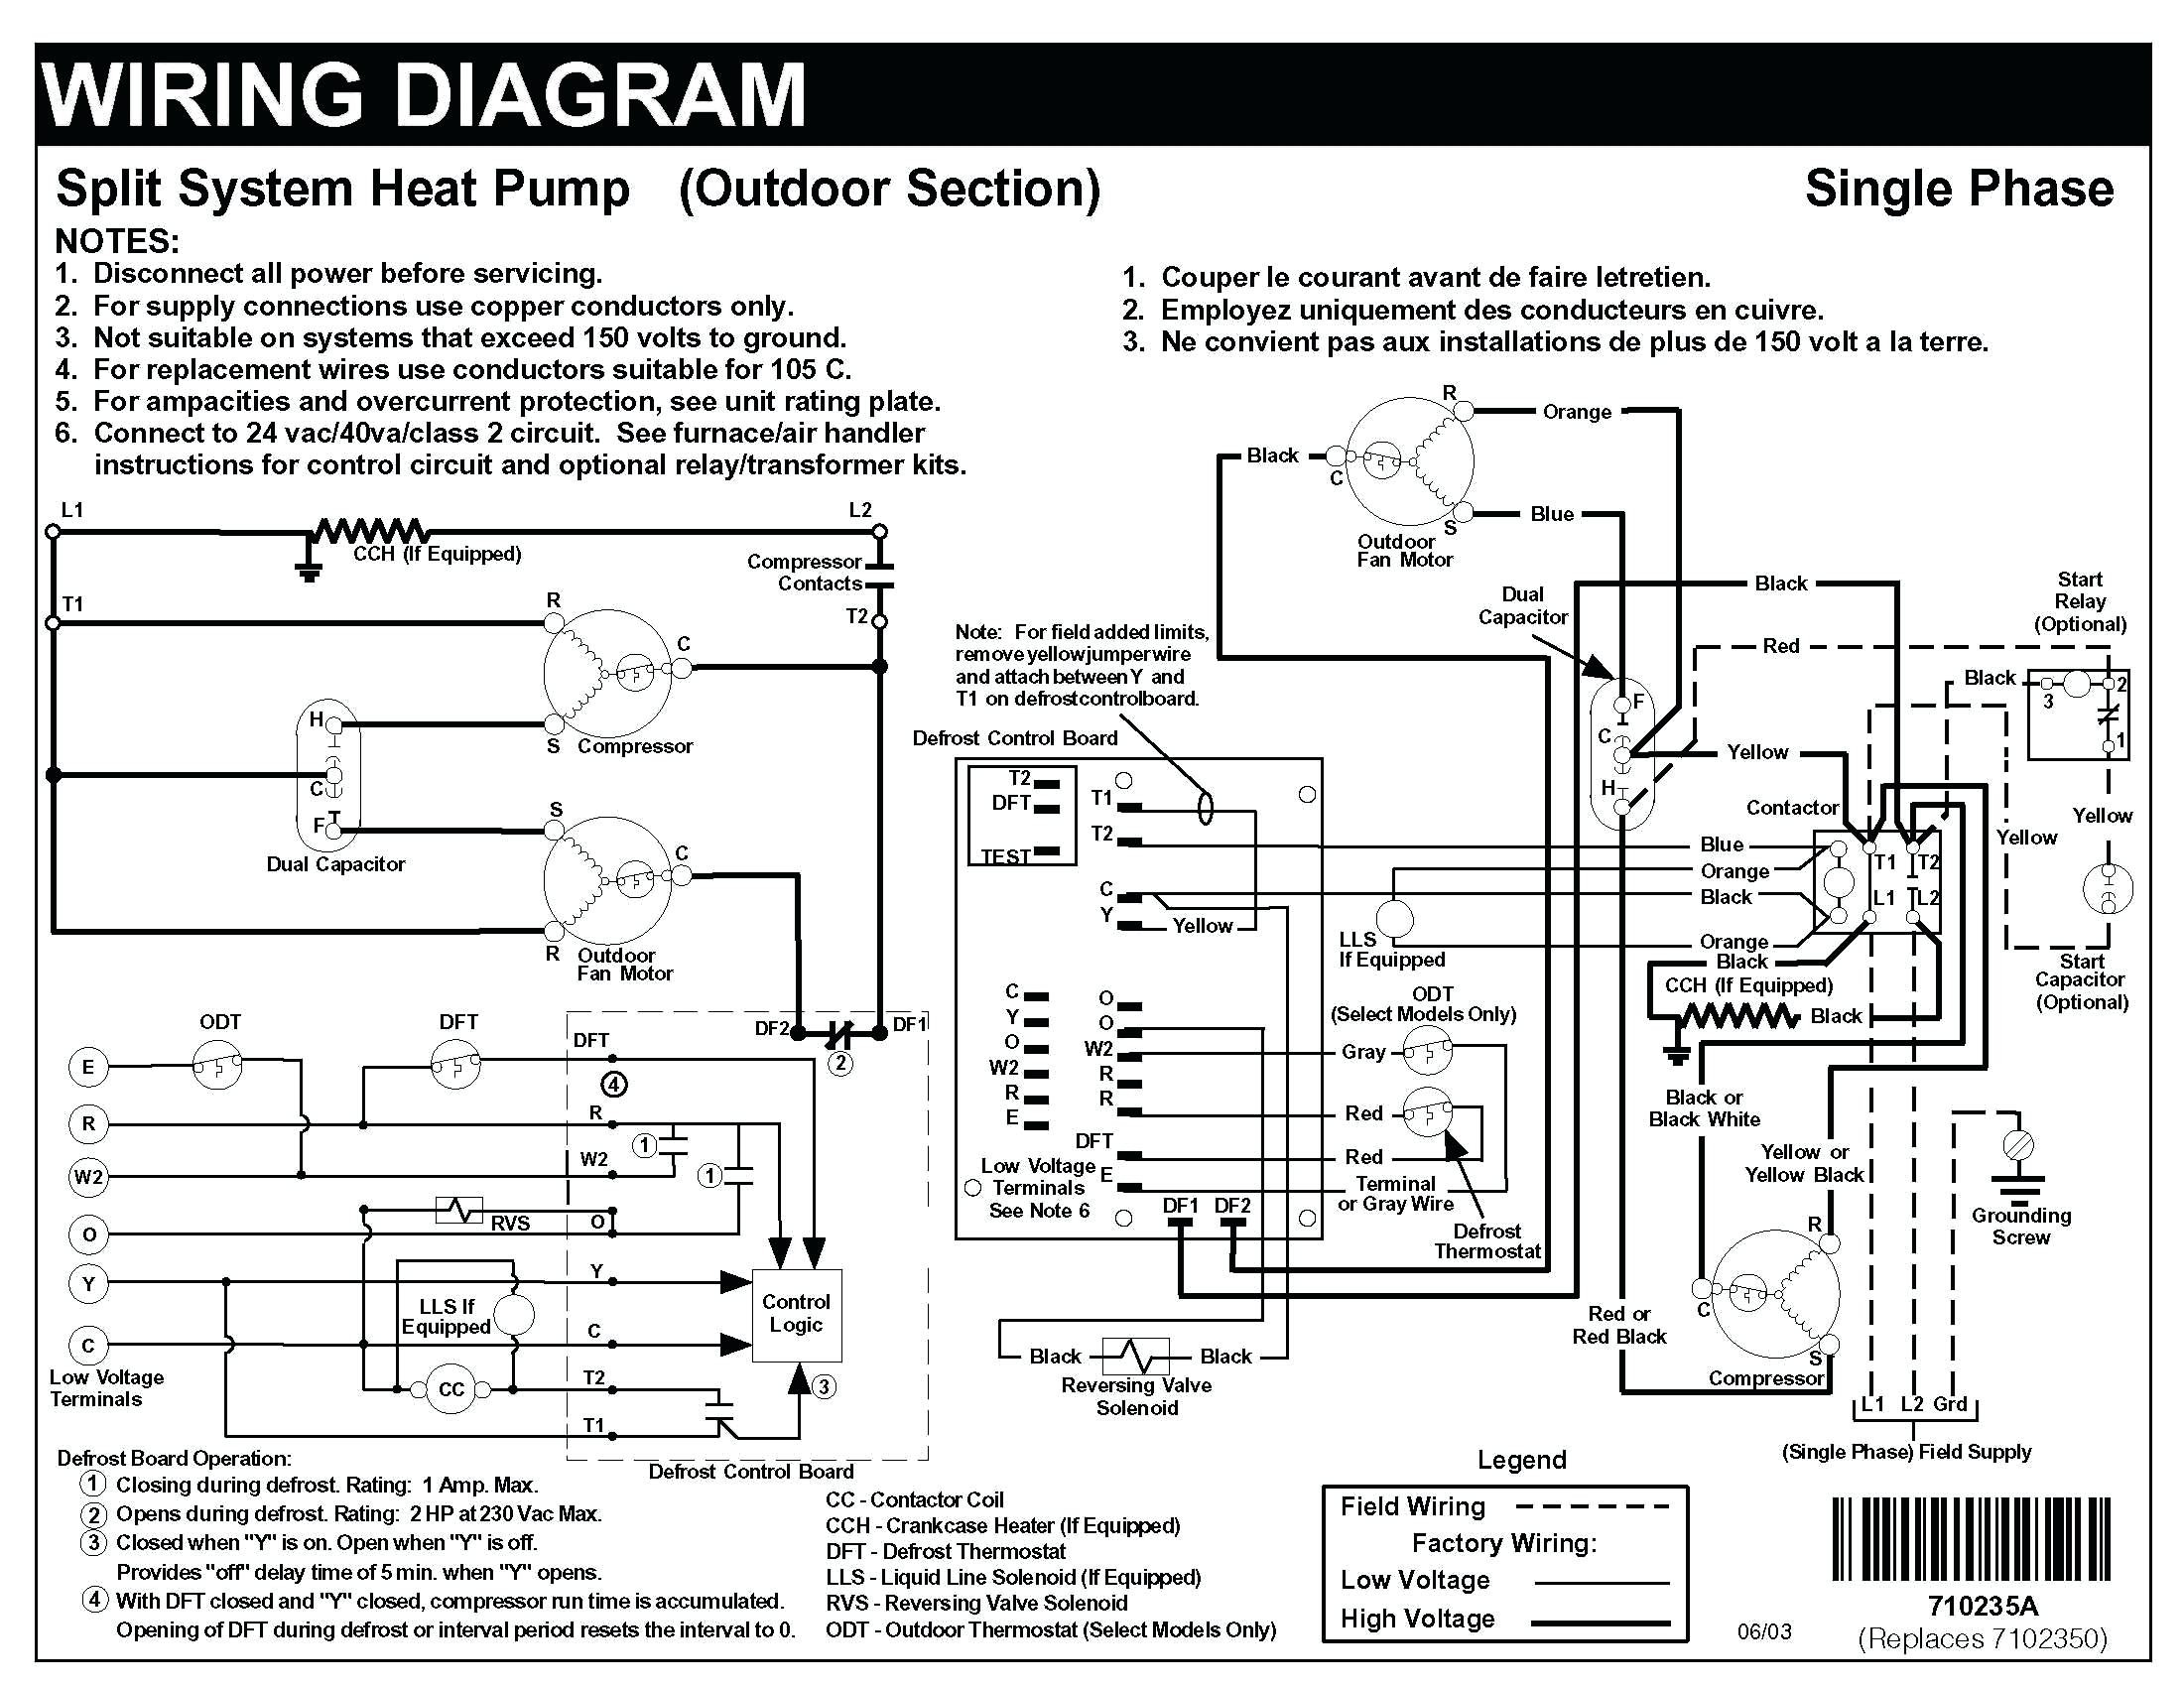 Swell Wrg 9599 Alpine Type R Wiring Diagram Wiring Cloud Xortanetembamohammedshrineorg